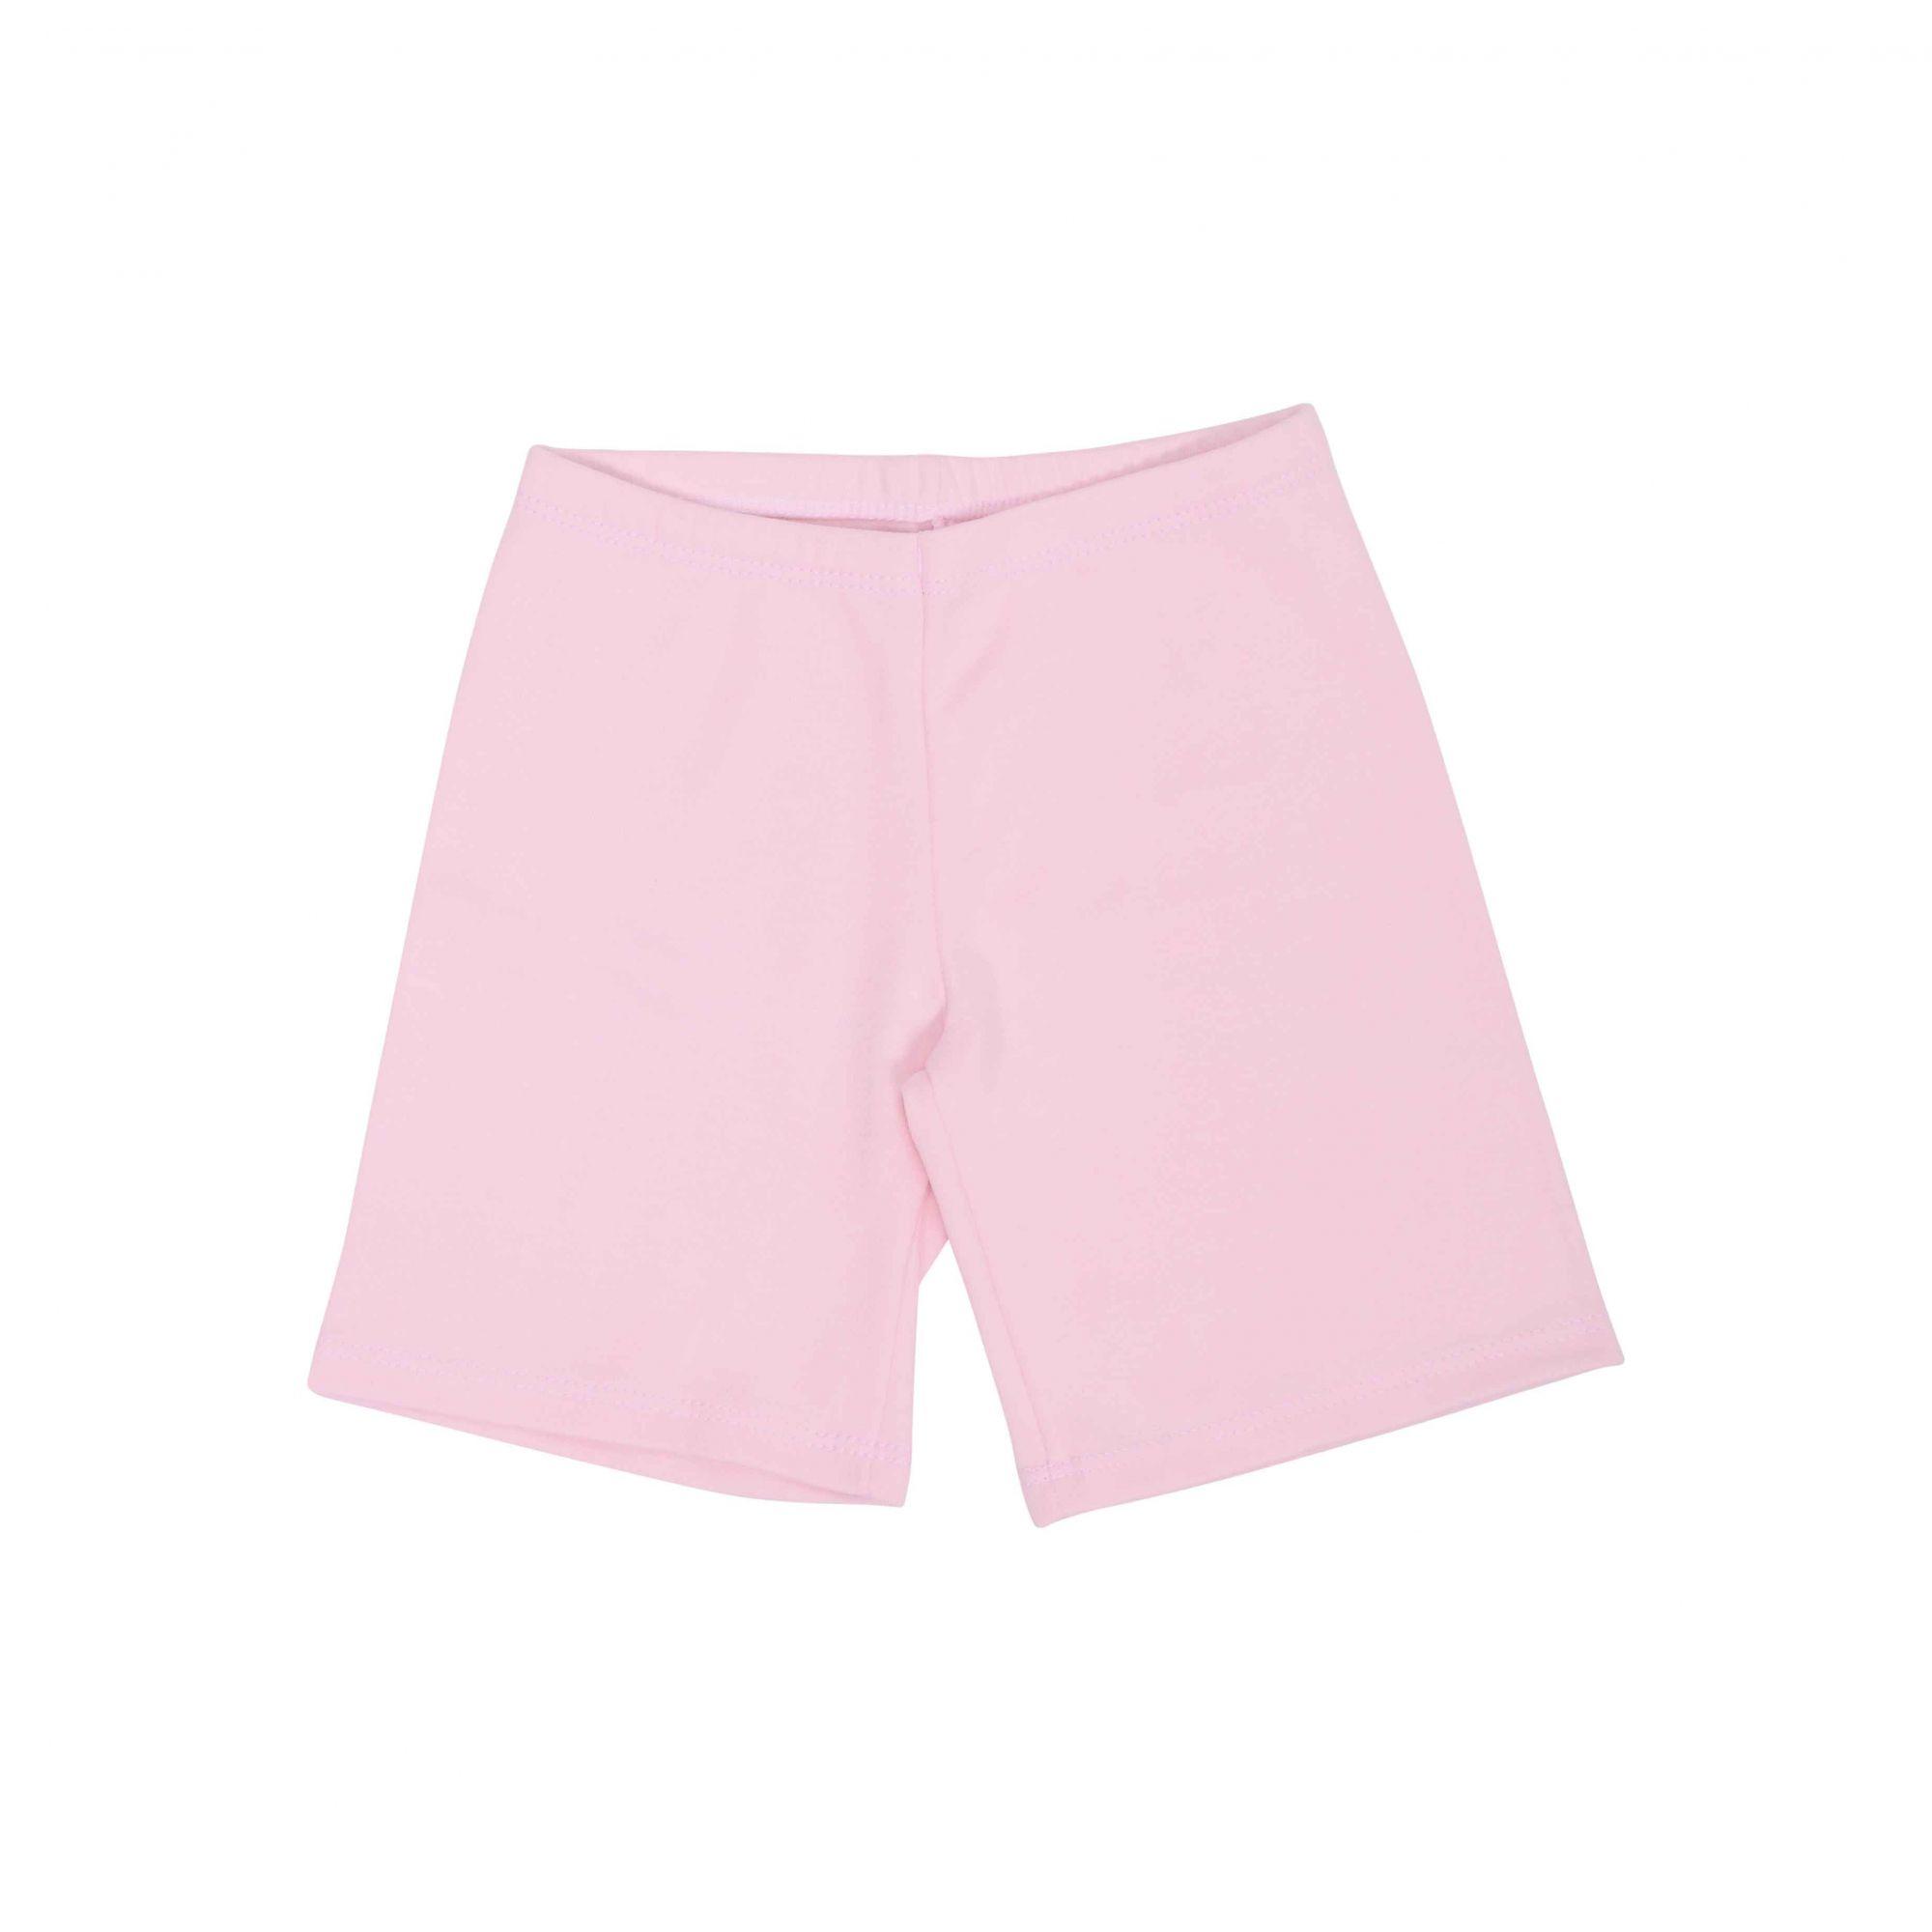 Kit Pijama Camiseta Manga Curta e Bermuda Rosa